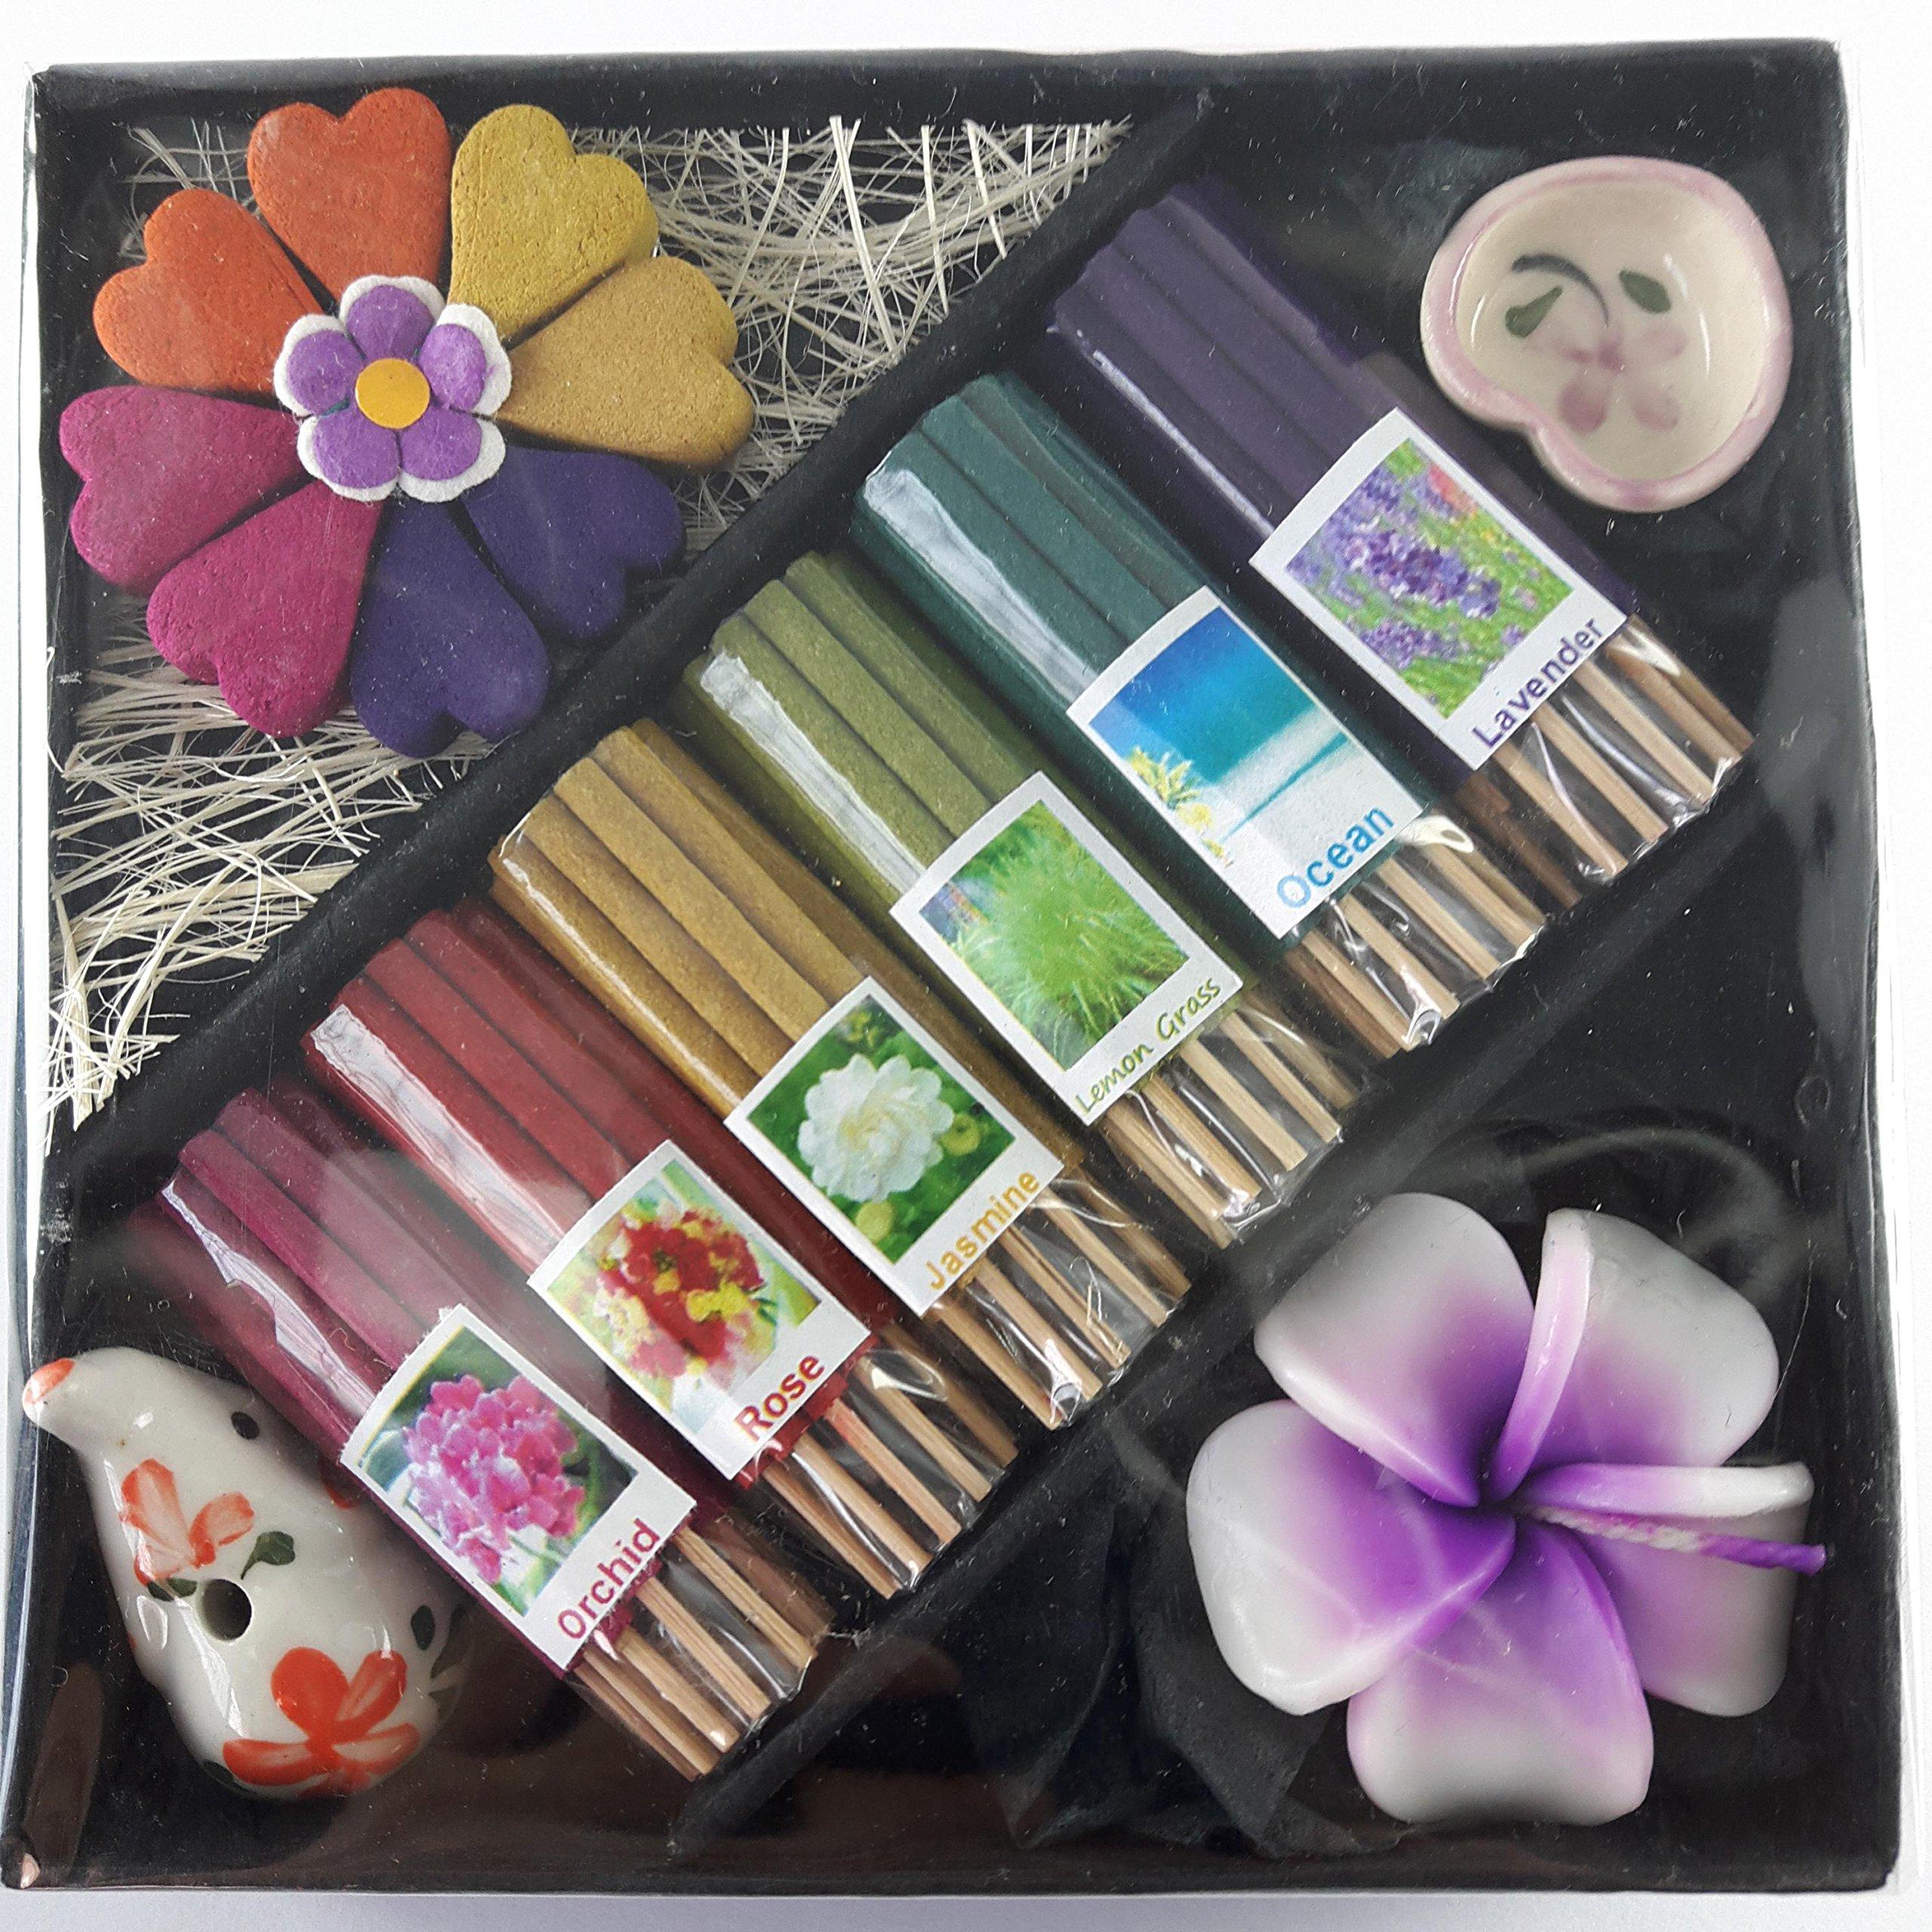 Thai Mix 6 Scent Relax Sticks Incense Spa Aroma Fragrance Cones Burner Ceramic Holder